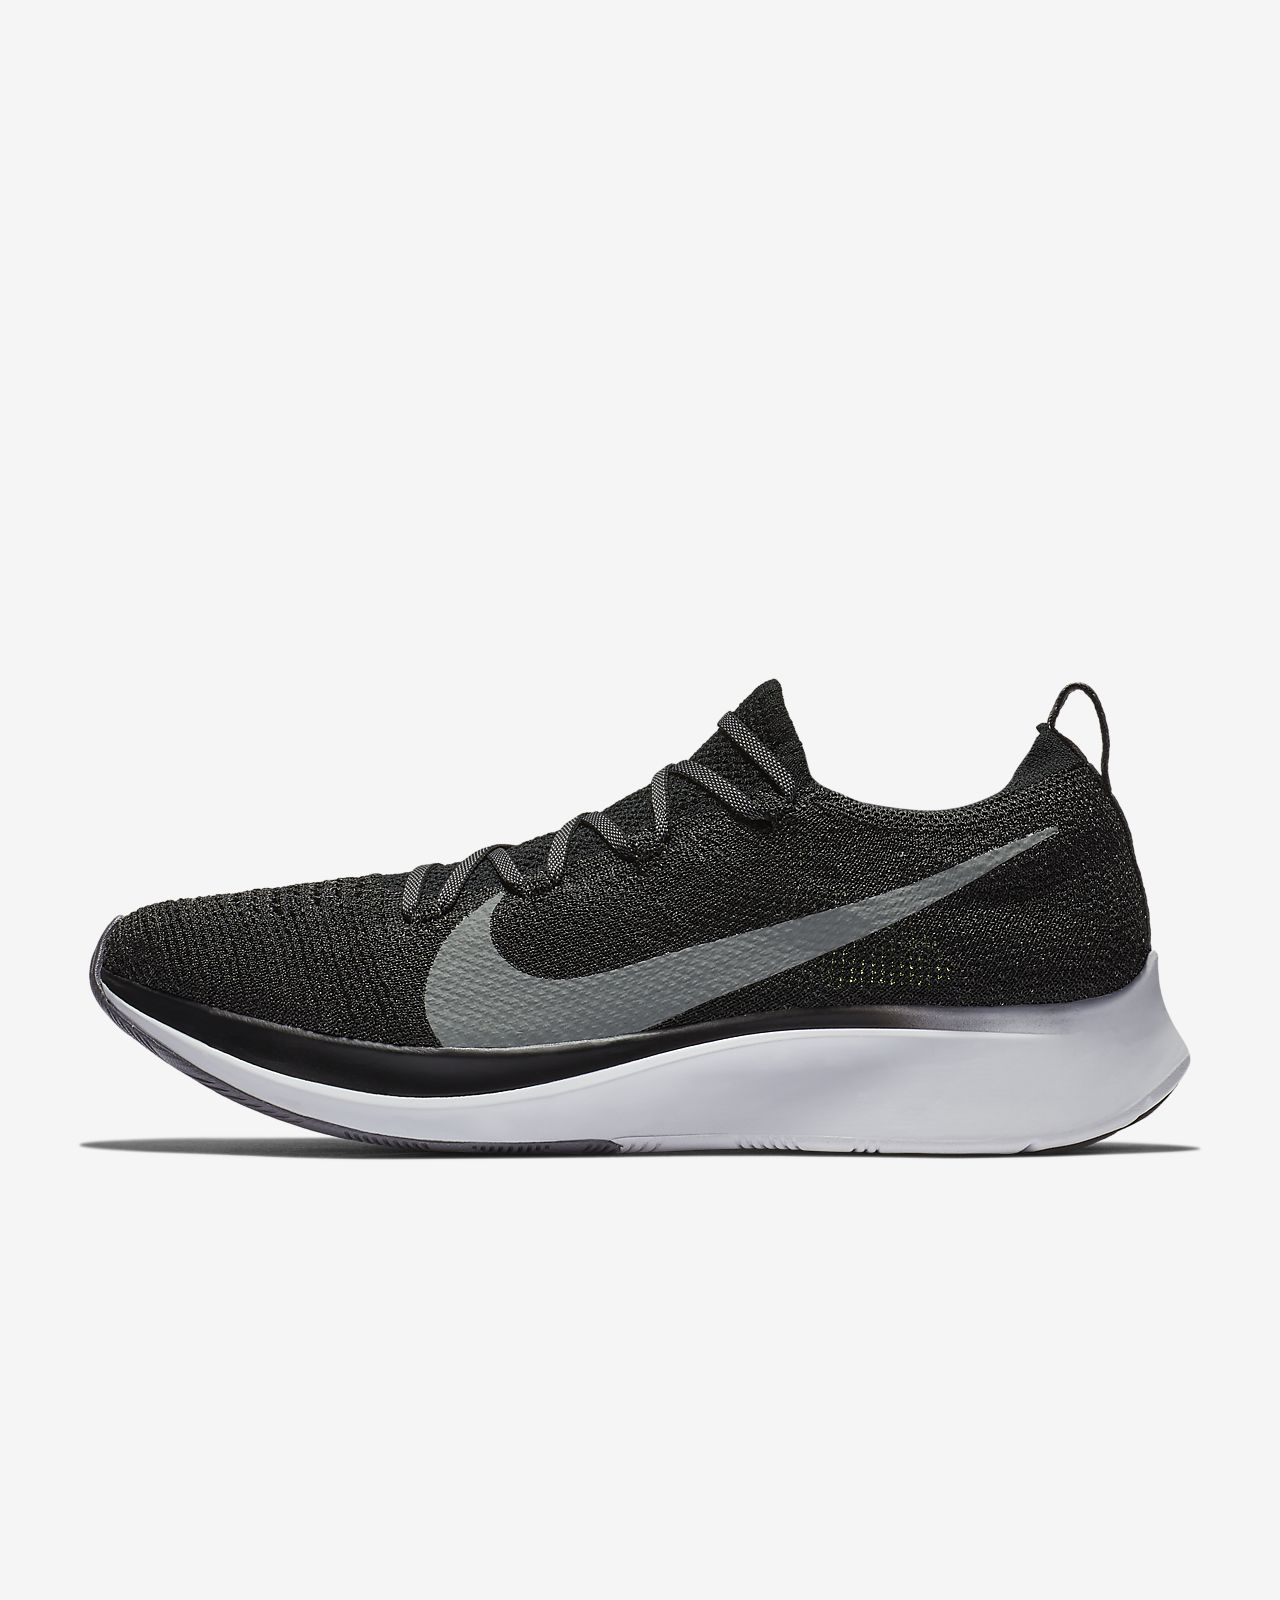 Nike flyknit air max hombre zapatillas 21,nike zapatillas